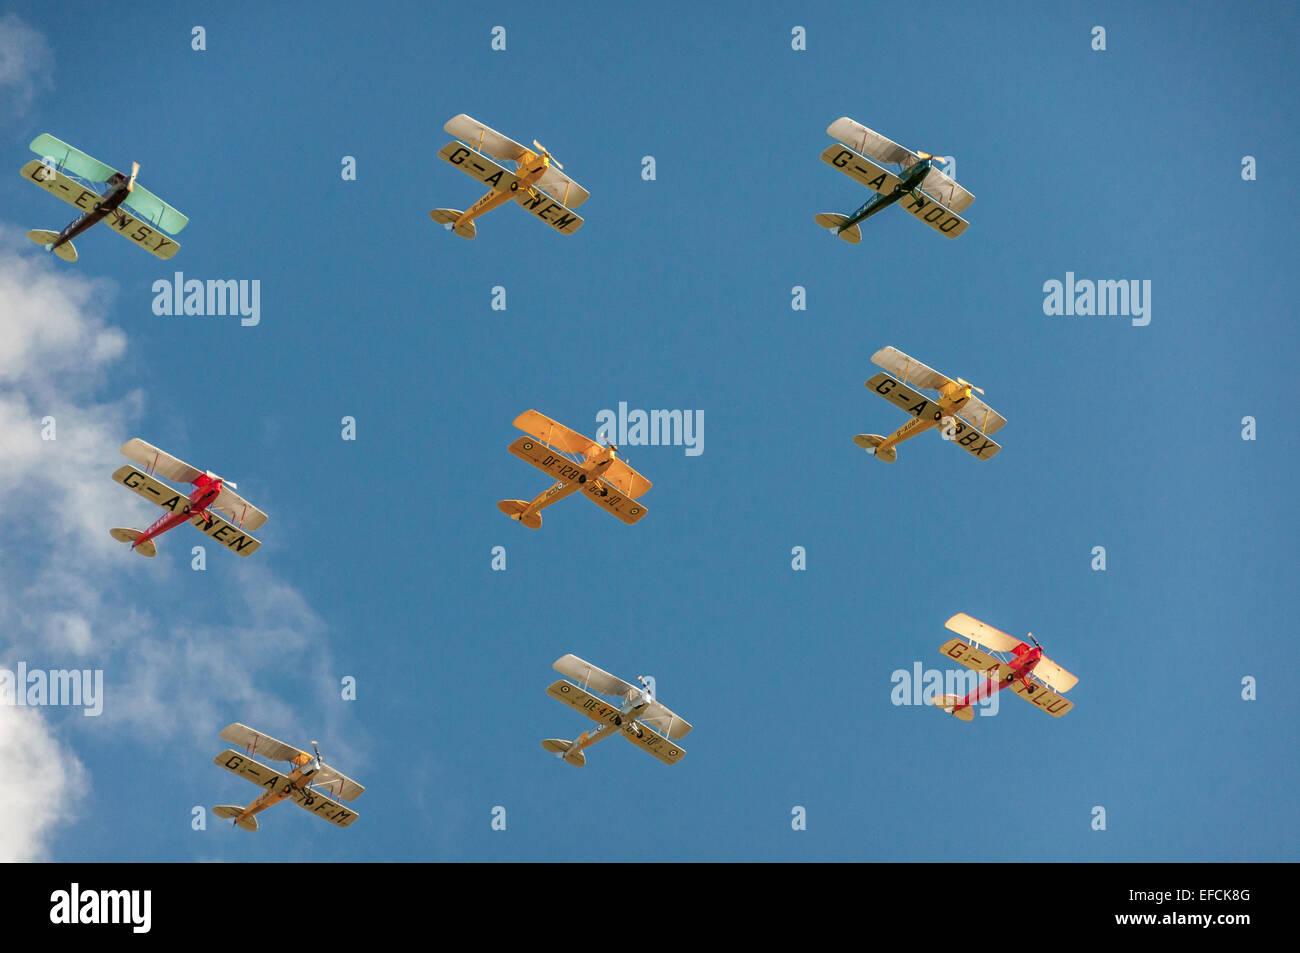 Nine De Havilland Tiger Moths, 1930s biplane, flying in formation at Kemble Airshow - Stock Image